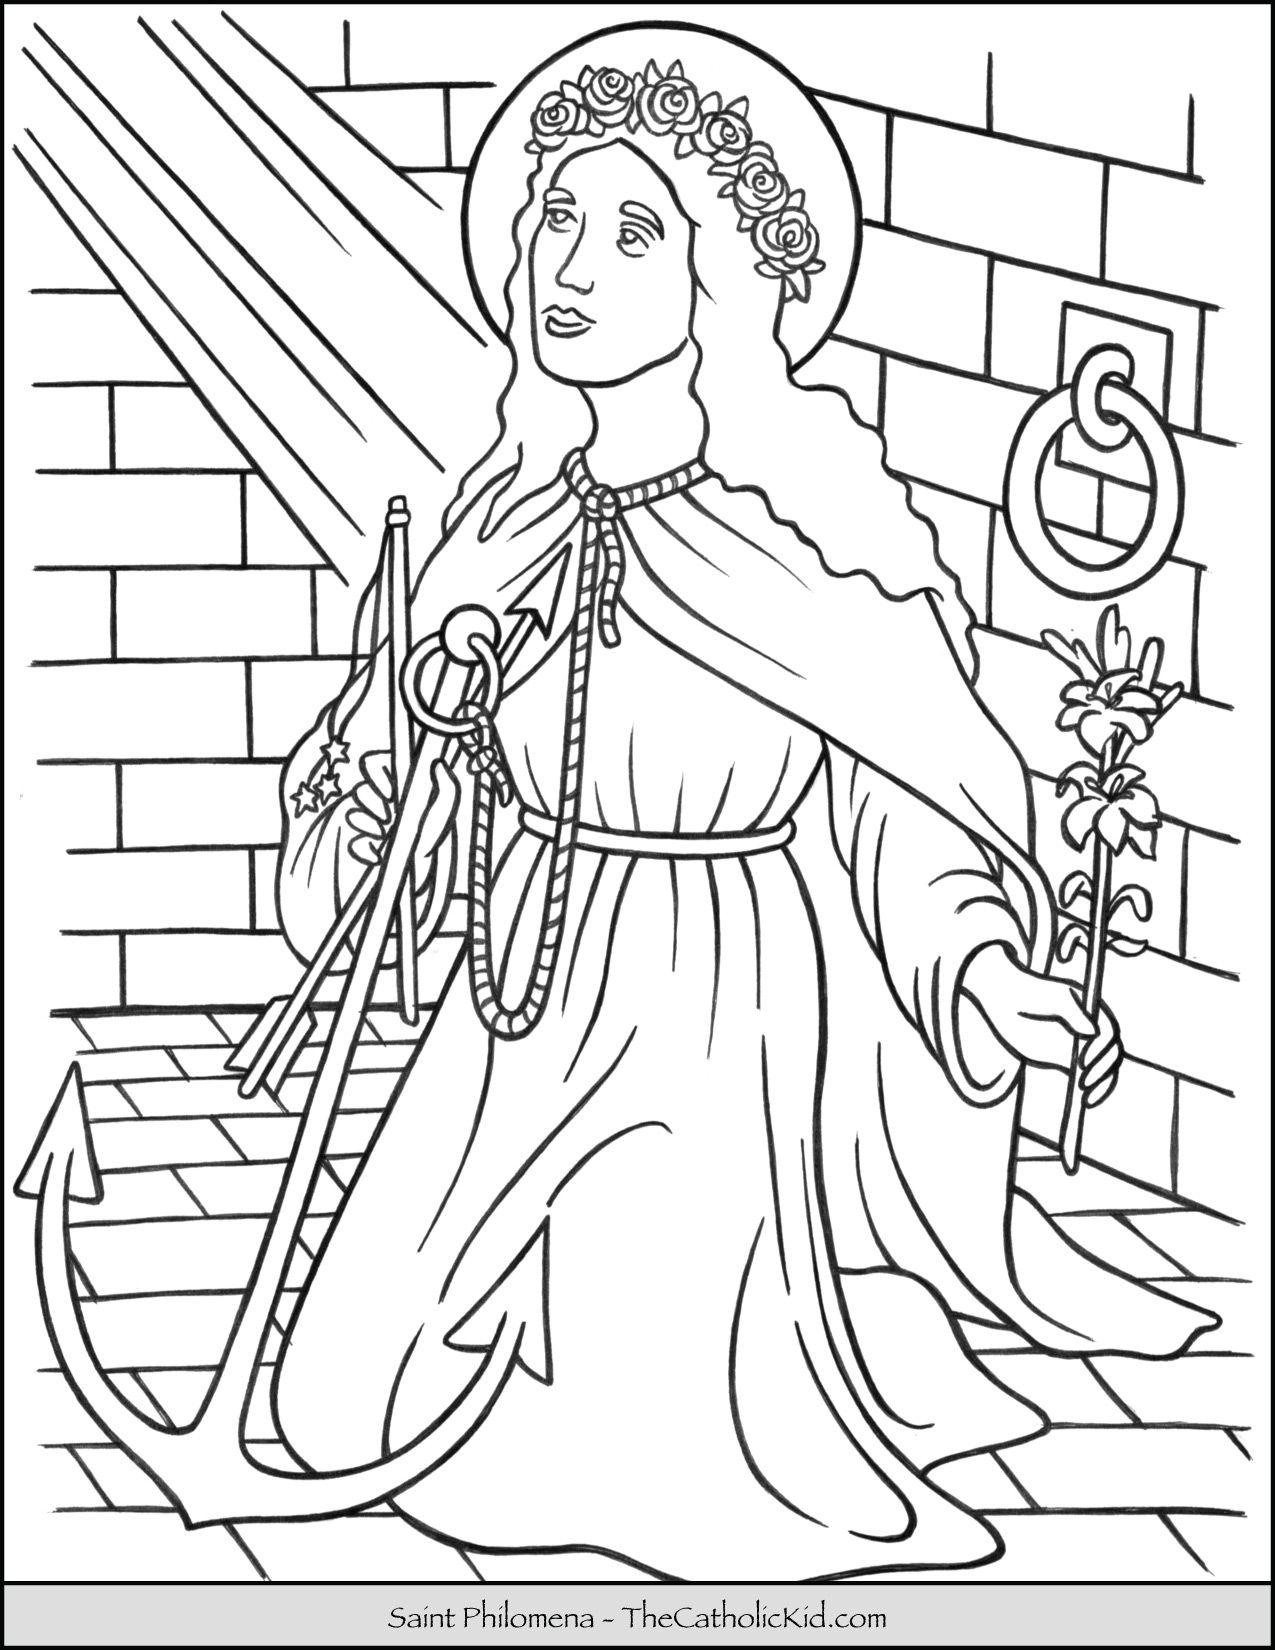 Saint Philomena Coloring Page Thecatholickid Com Saint